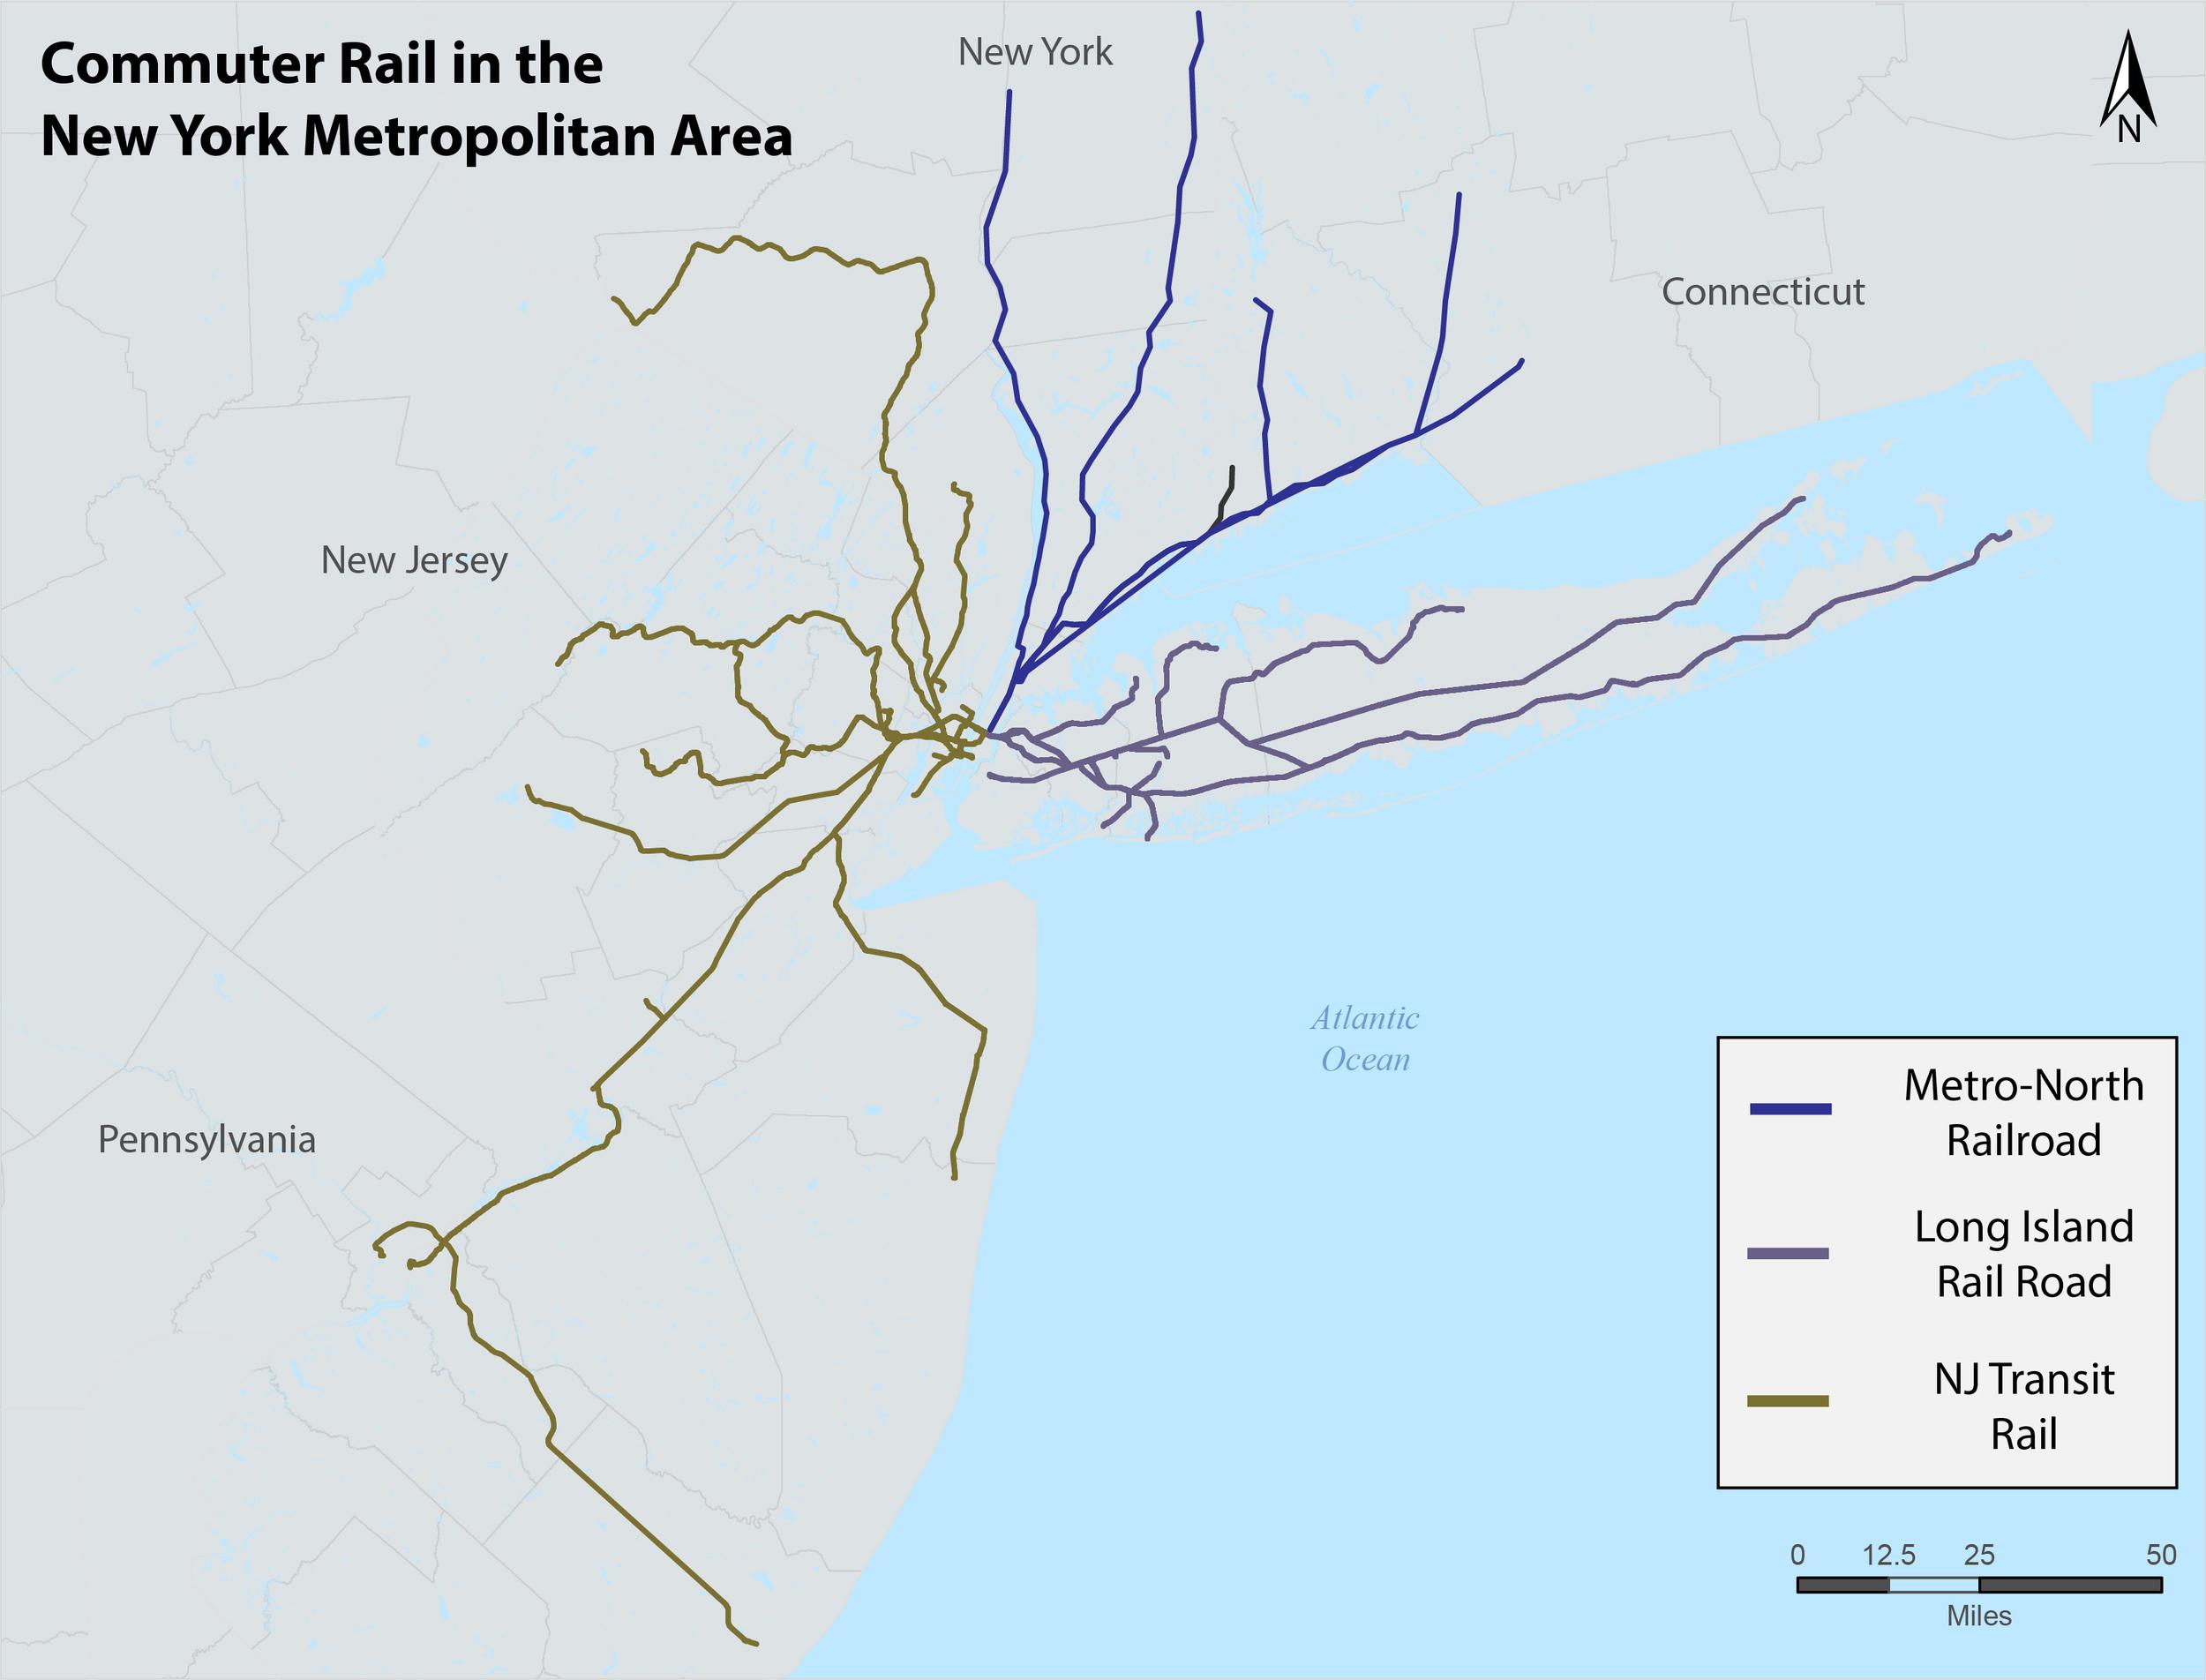 Locational data provided by MTA